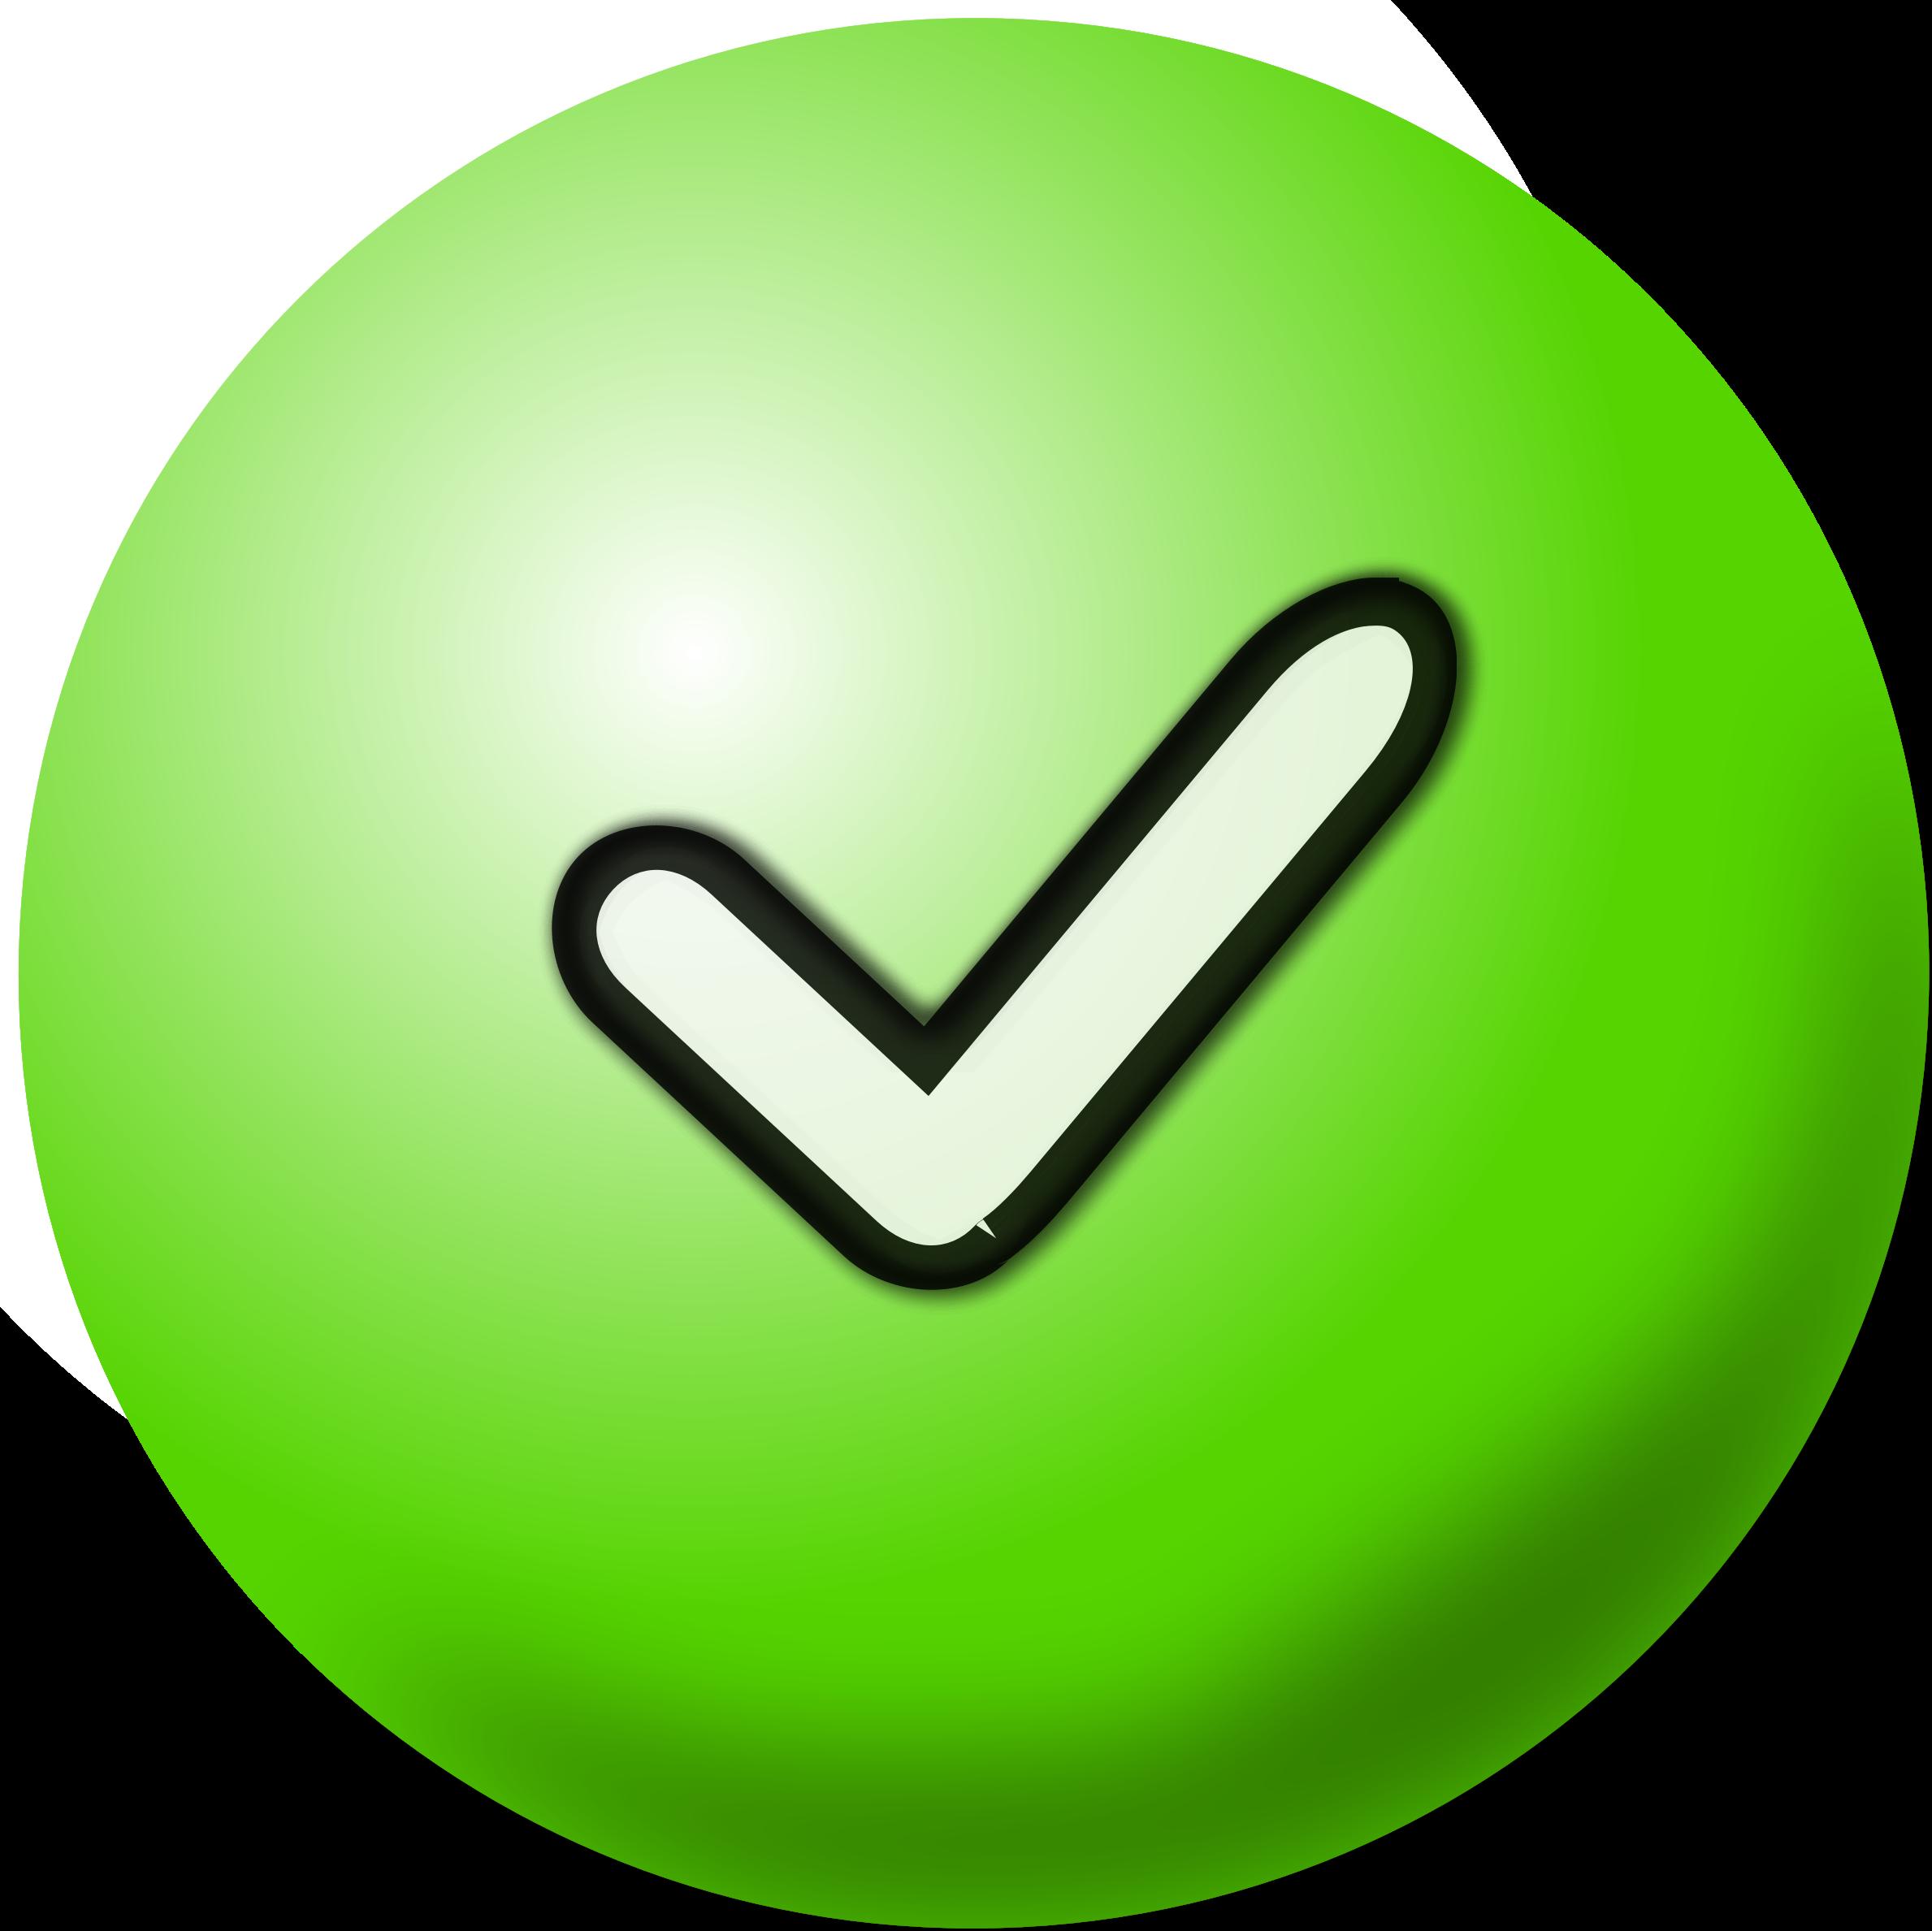 Line clipart green Clipart Mark Green Mark Check